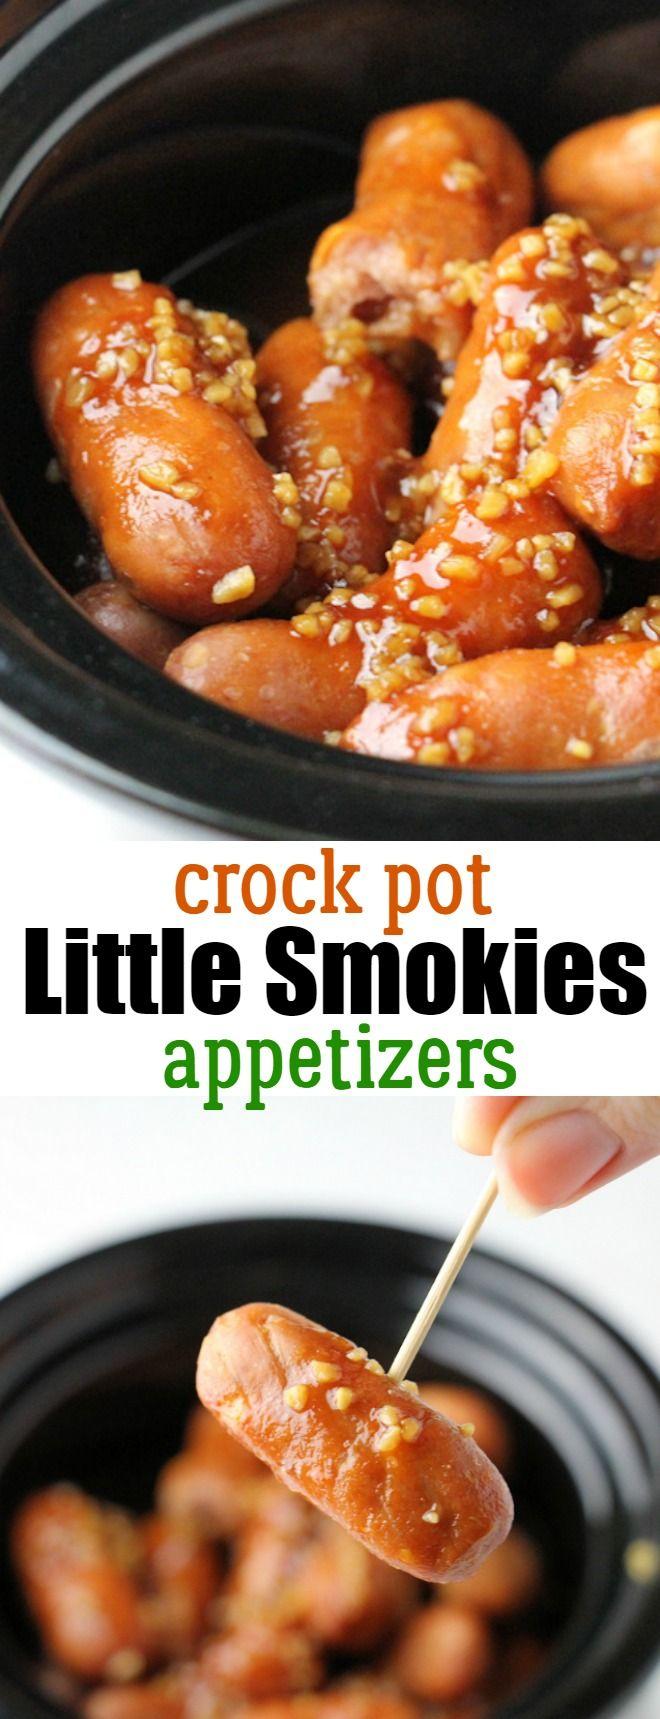 Little Smokies Crock Pot Recipe: Easy Little Smokies Appetizers that your guests will love!